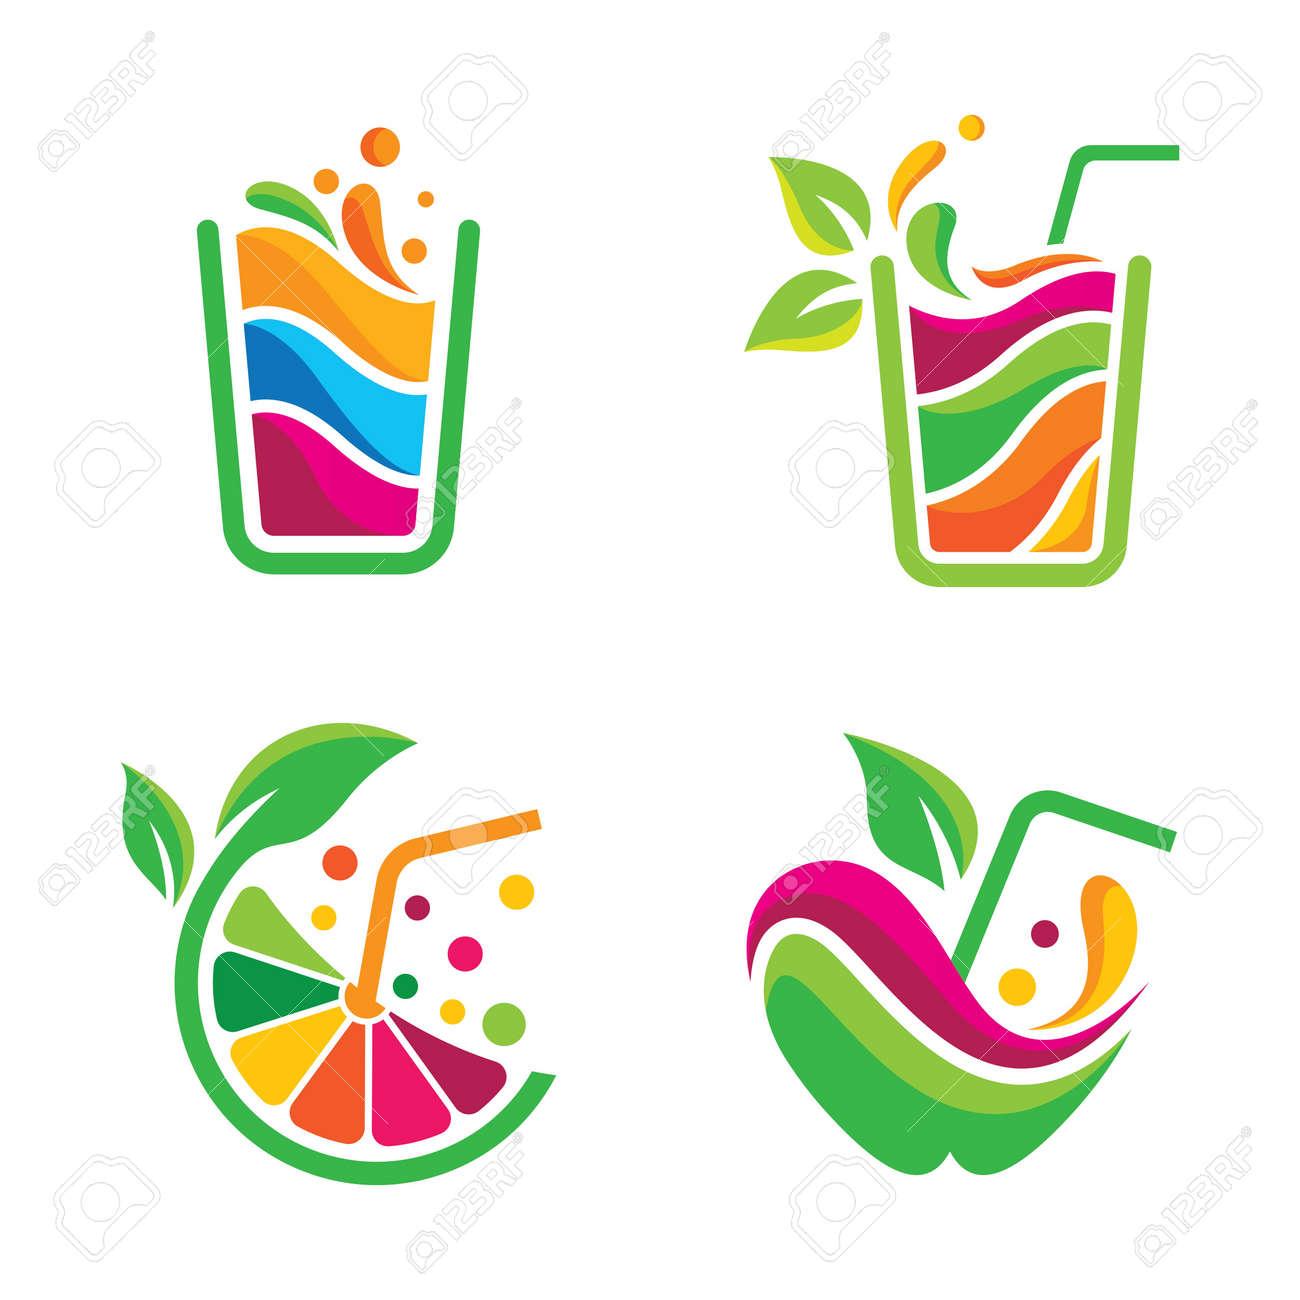 Fresh juice logo images illustration design - 173410511